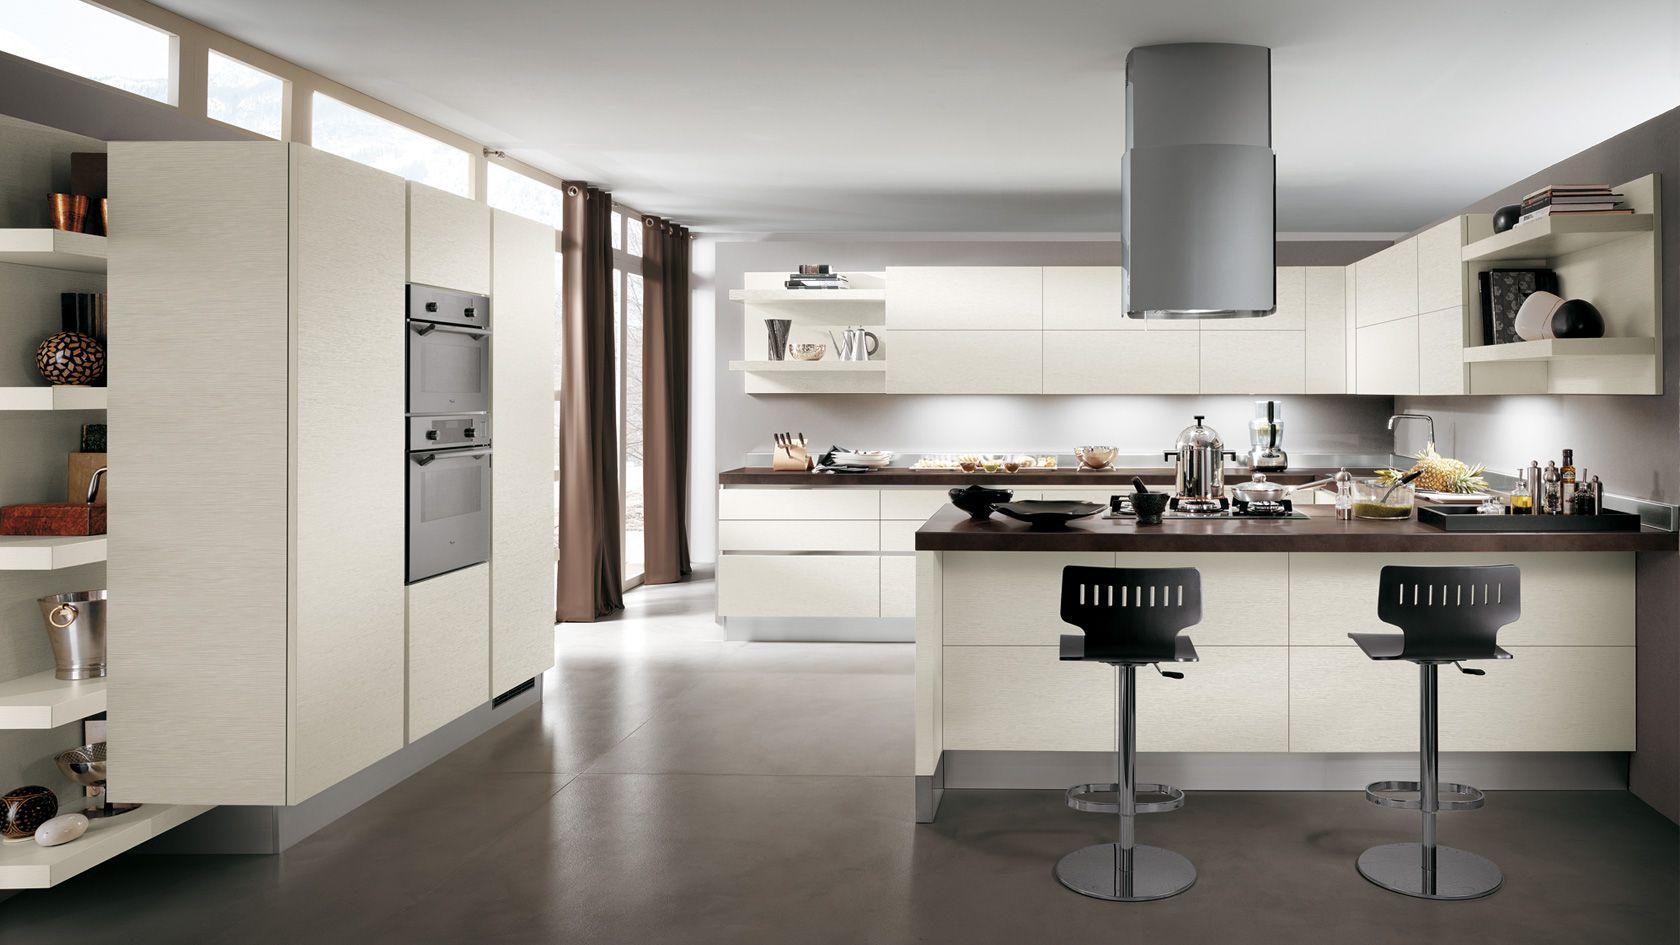 Cucina Scenery Scavolini | Scavolini Kitchens | Pinterest | Scenery ...